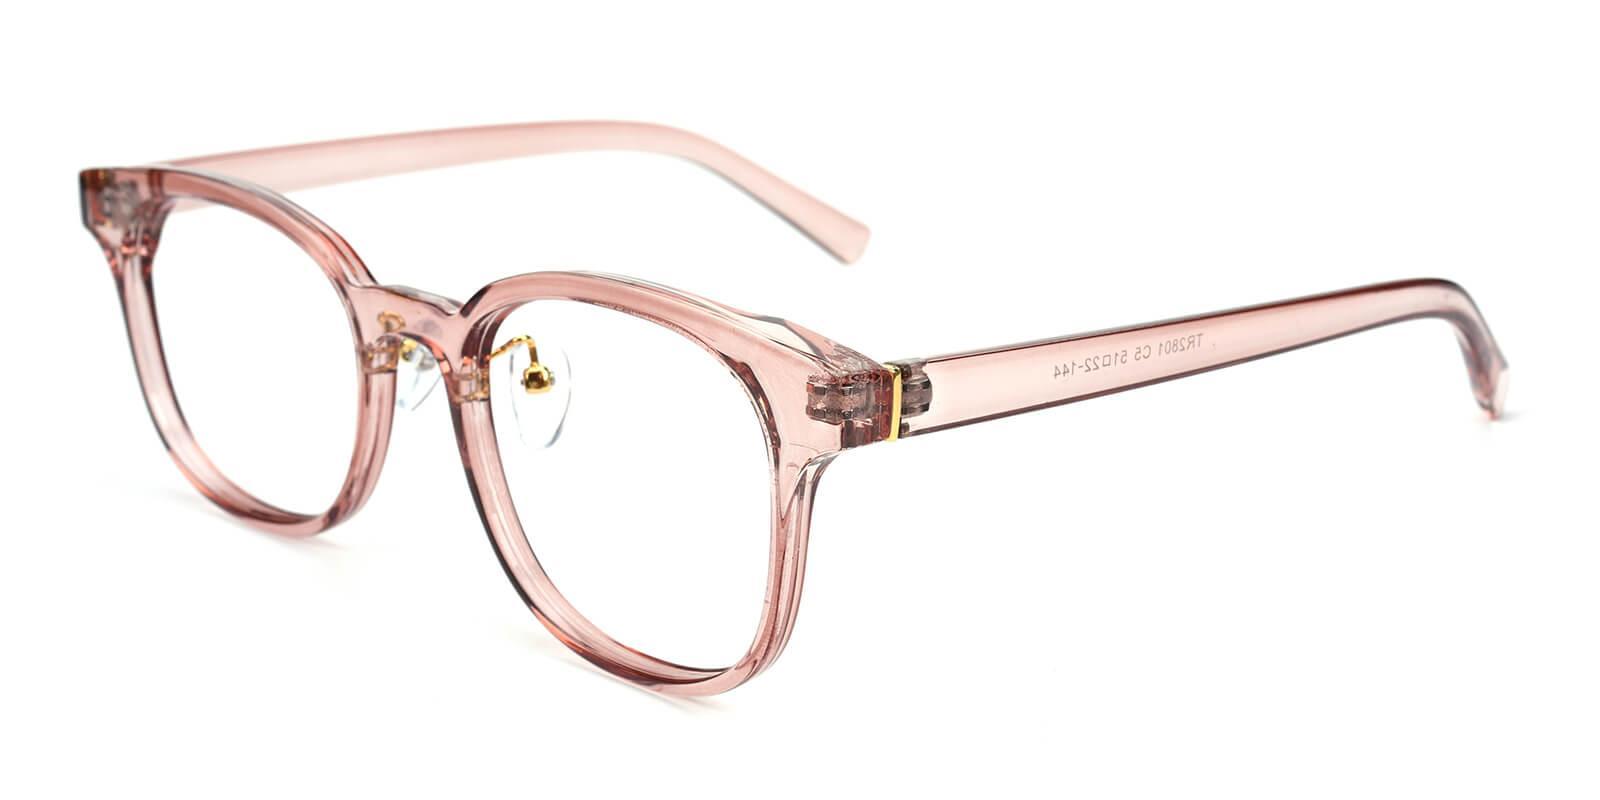 Durns-Pink-Square-TR-Eyeglasses-detail